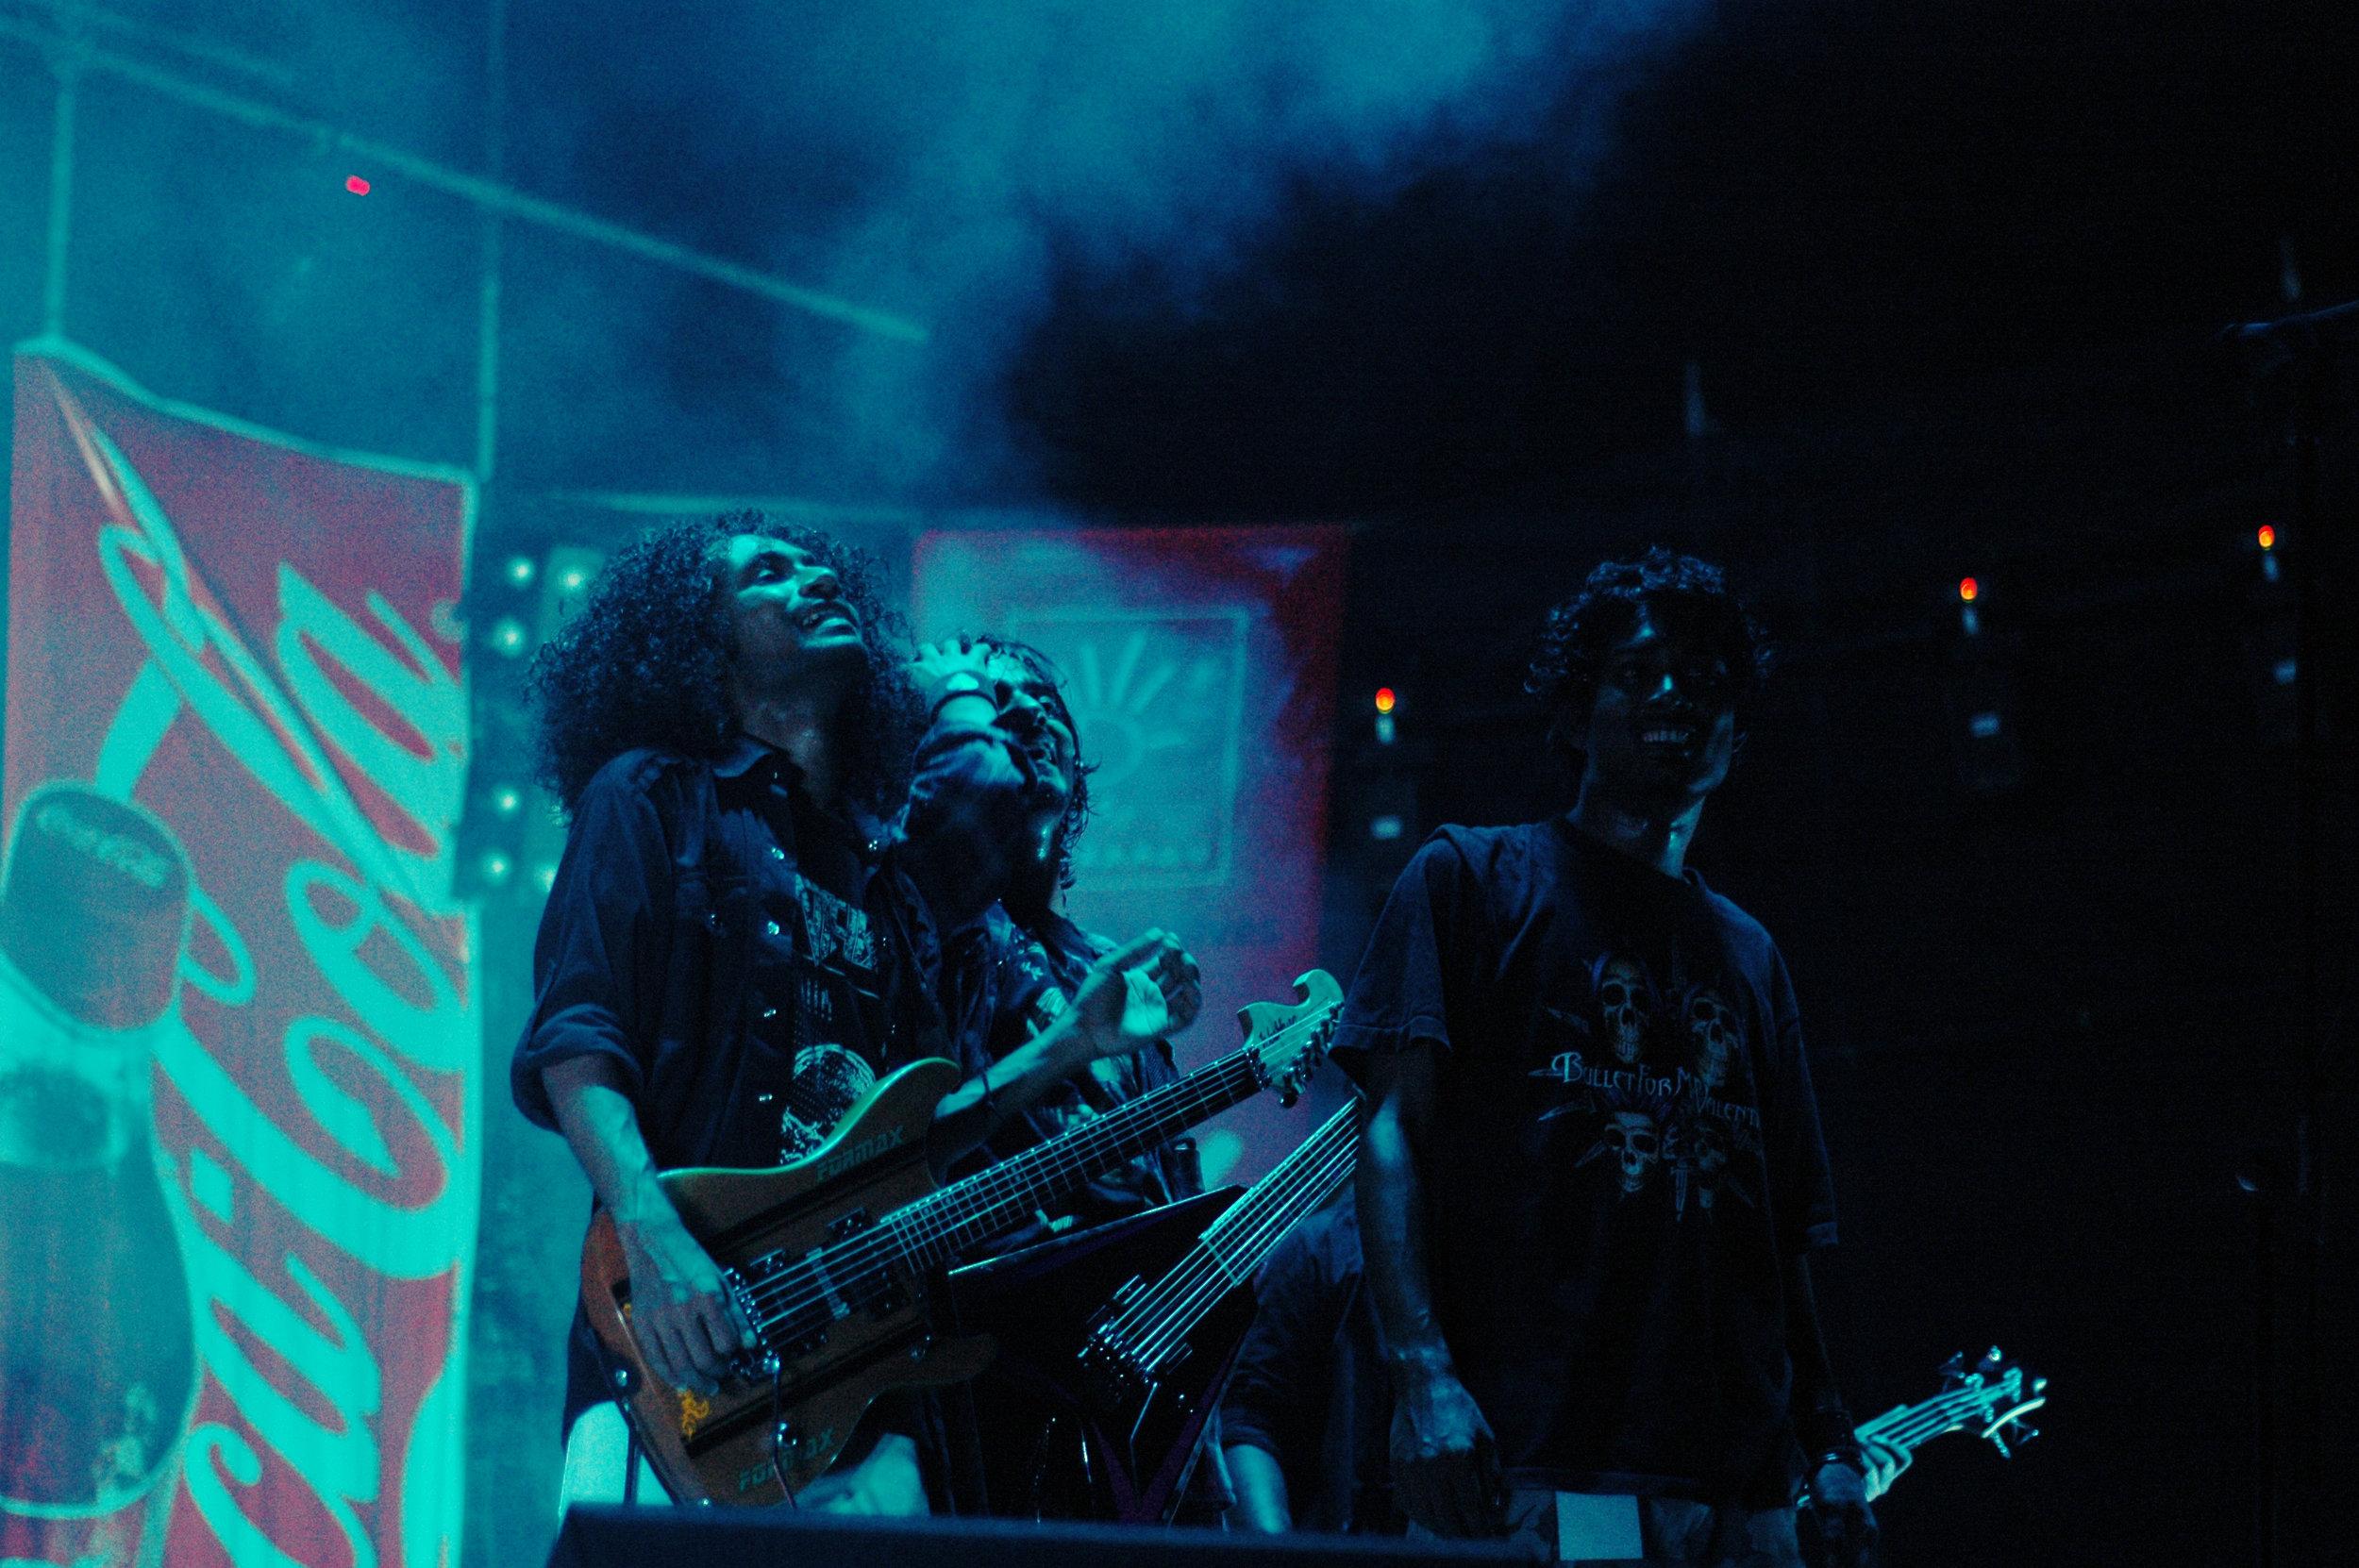 2009-12-11 - Male' City - Breakout Festival - D70s -  - Sacred Legacy (11).jpg